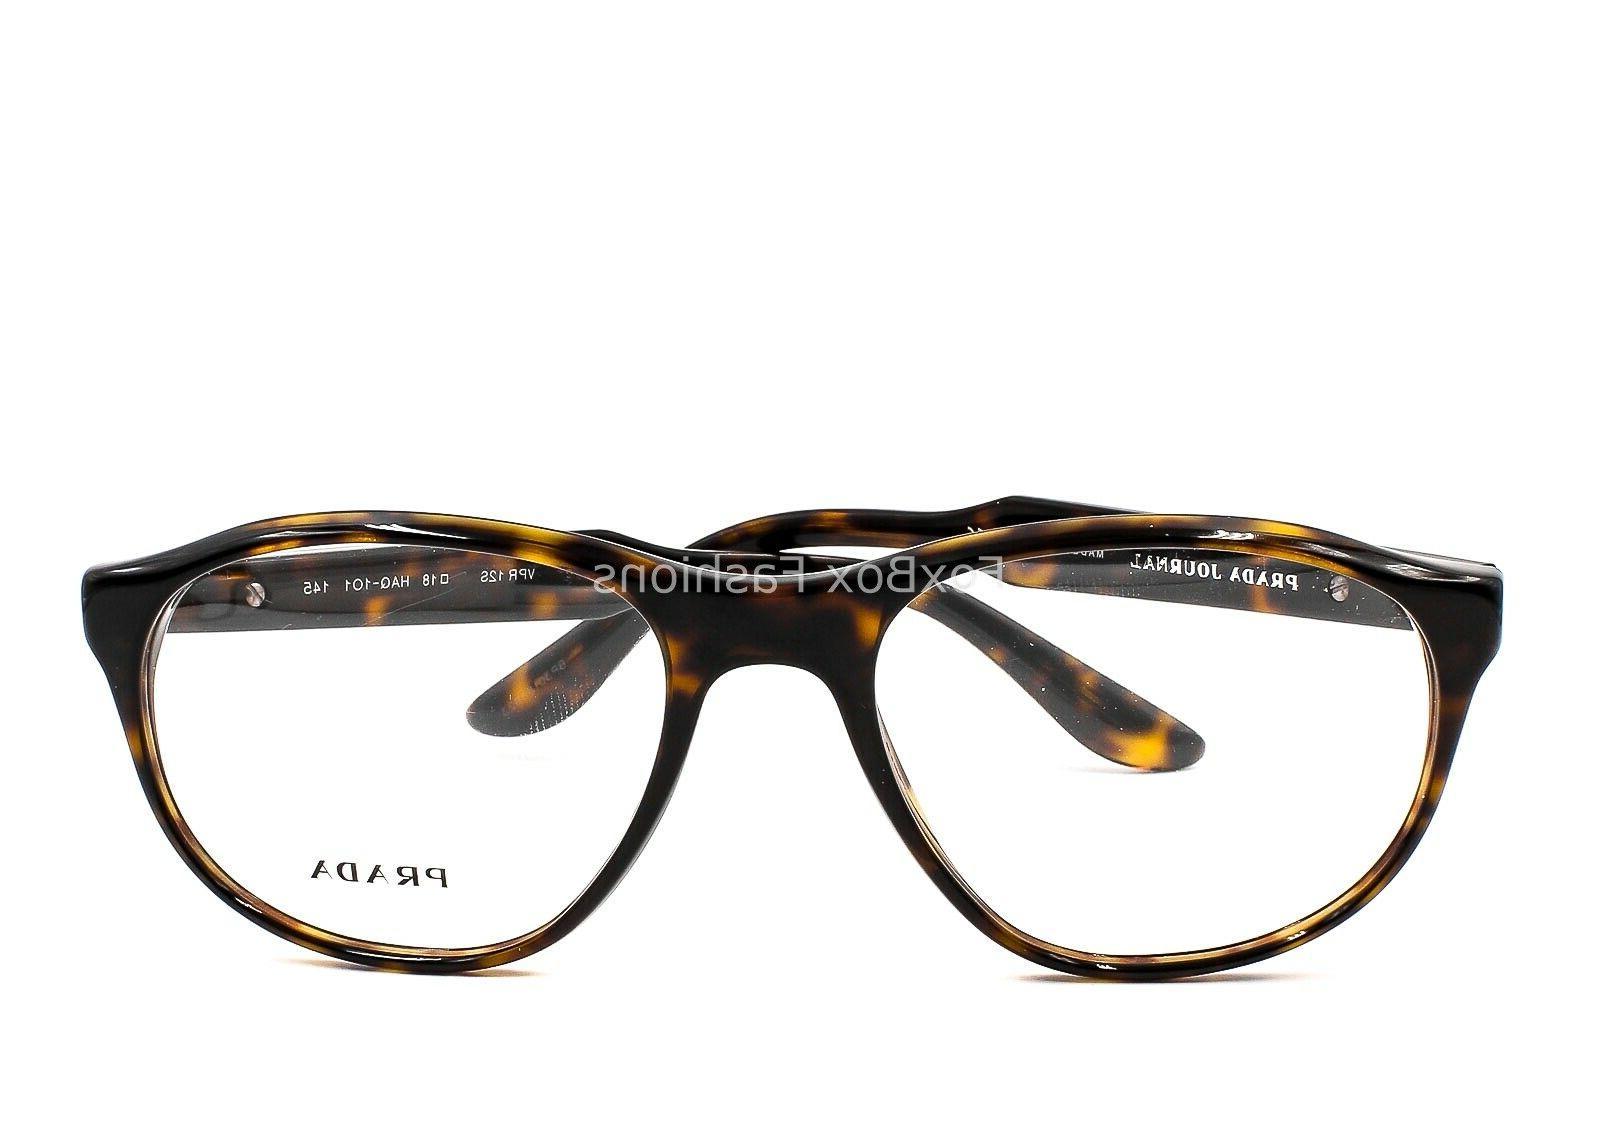 Prada Journal VPR 12S HAQ-1O1 Eyeglasses Frames Glasses Brow